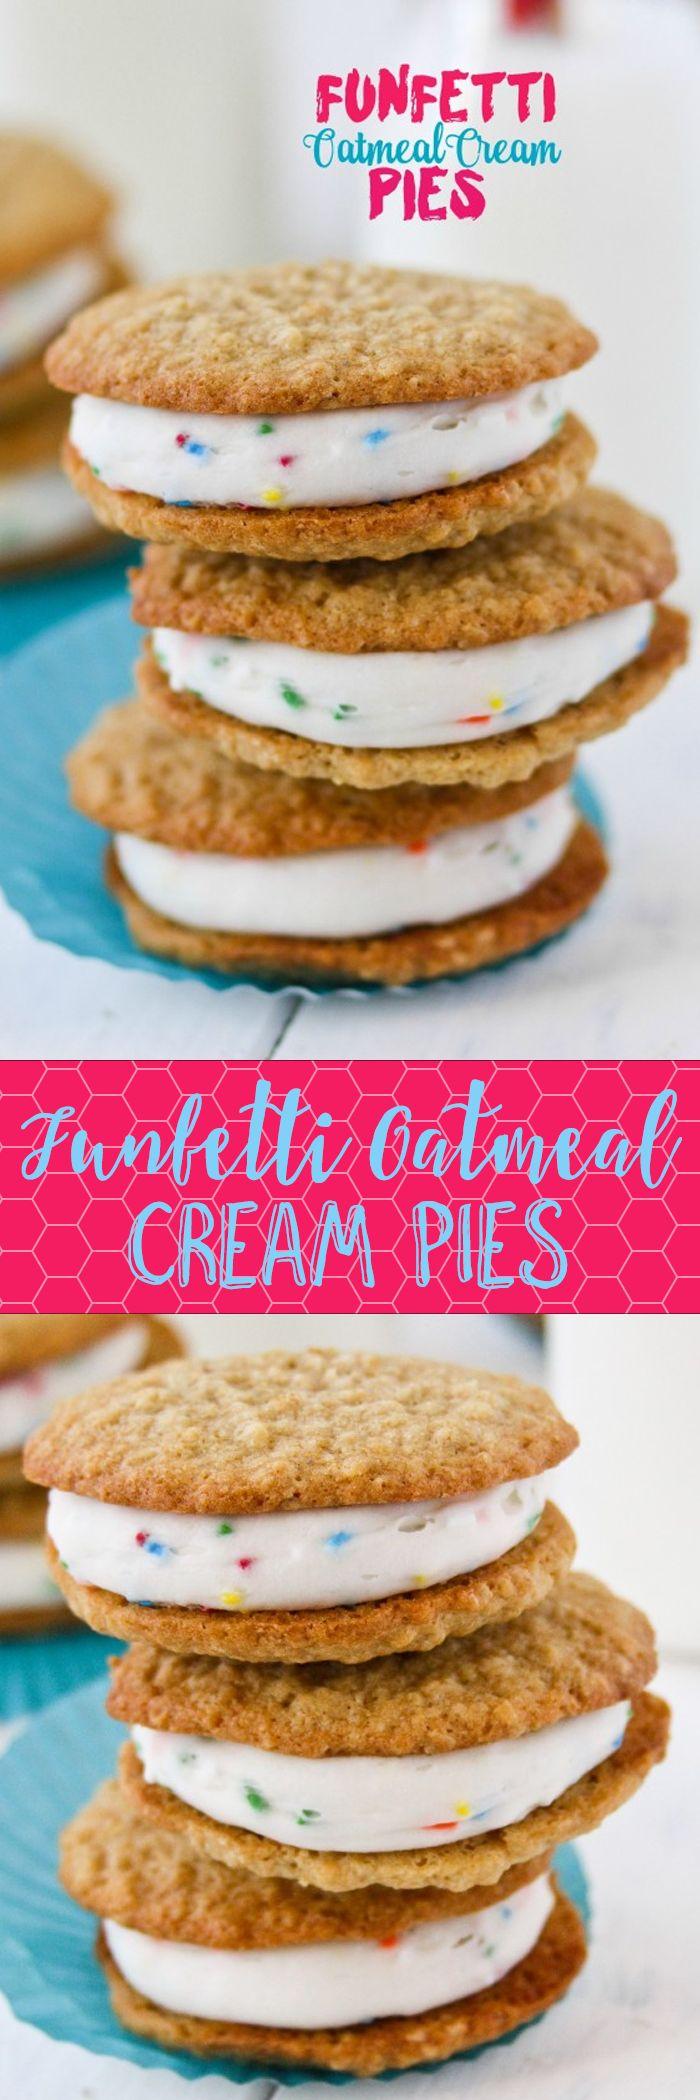 Funfetti Oatmeal Cream Pies Recipe Cream Pie Oatmeal Cream Pies Oatmeal Cream